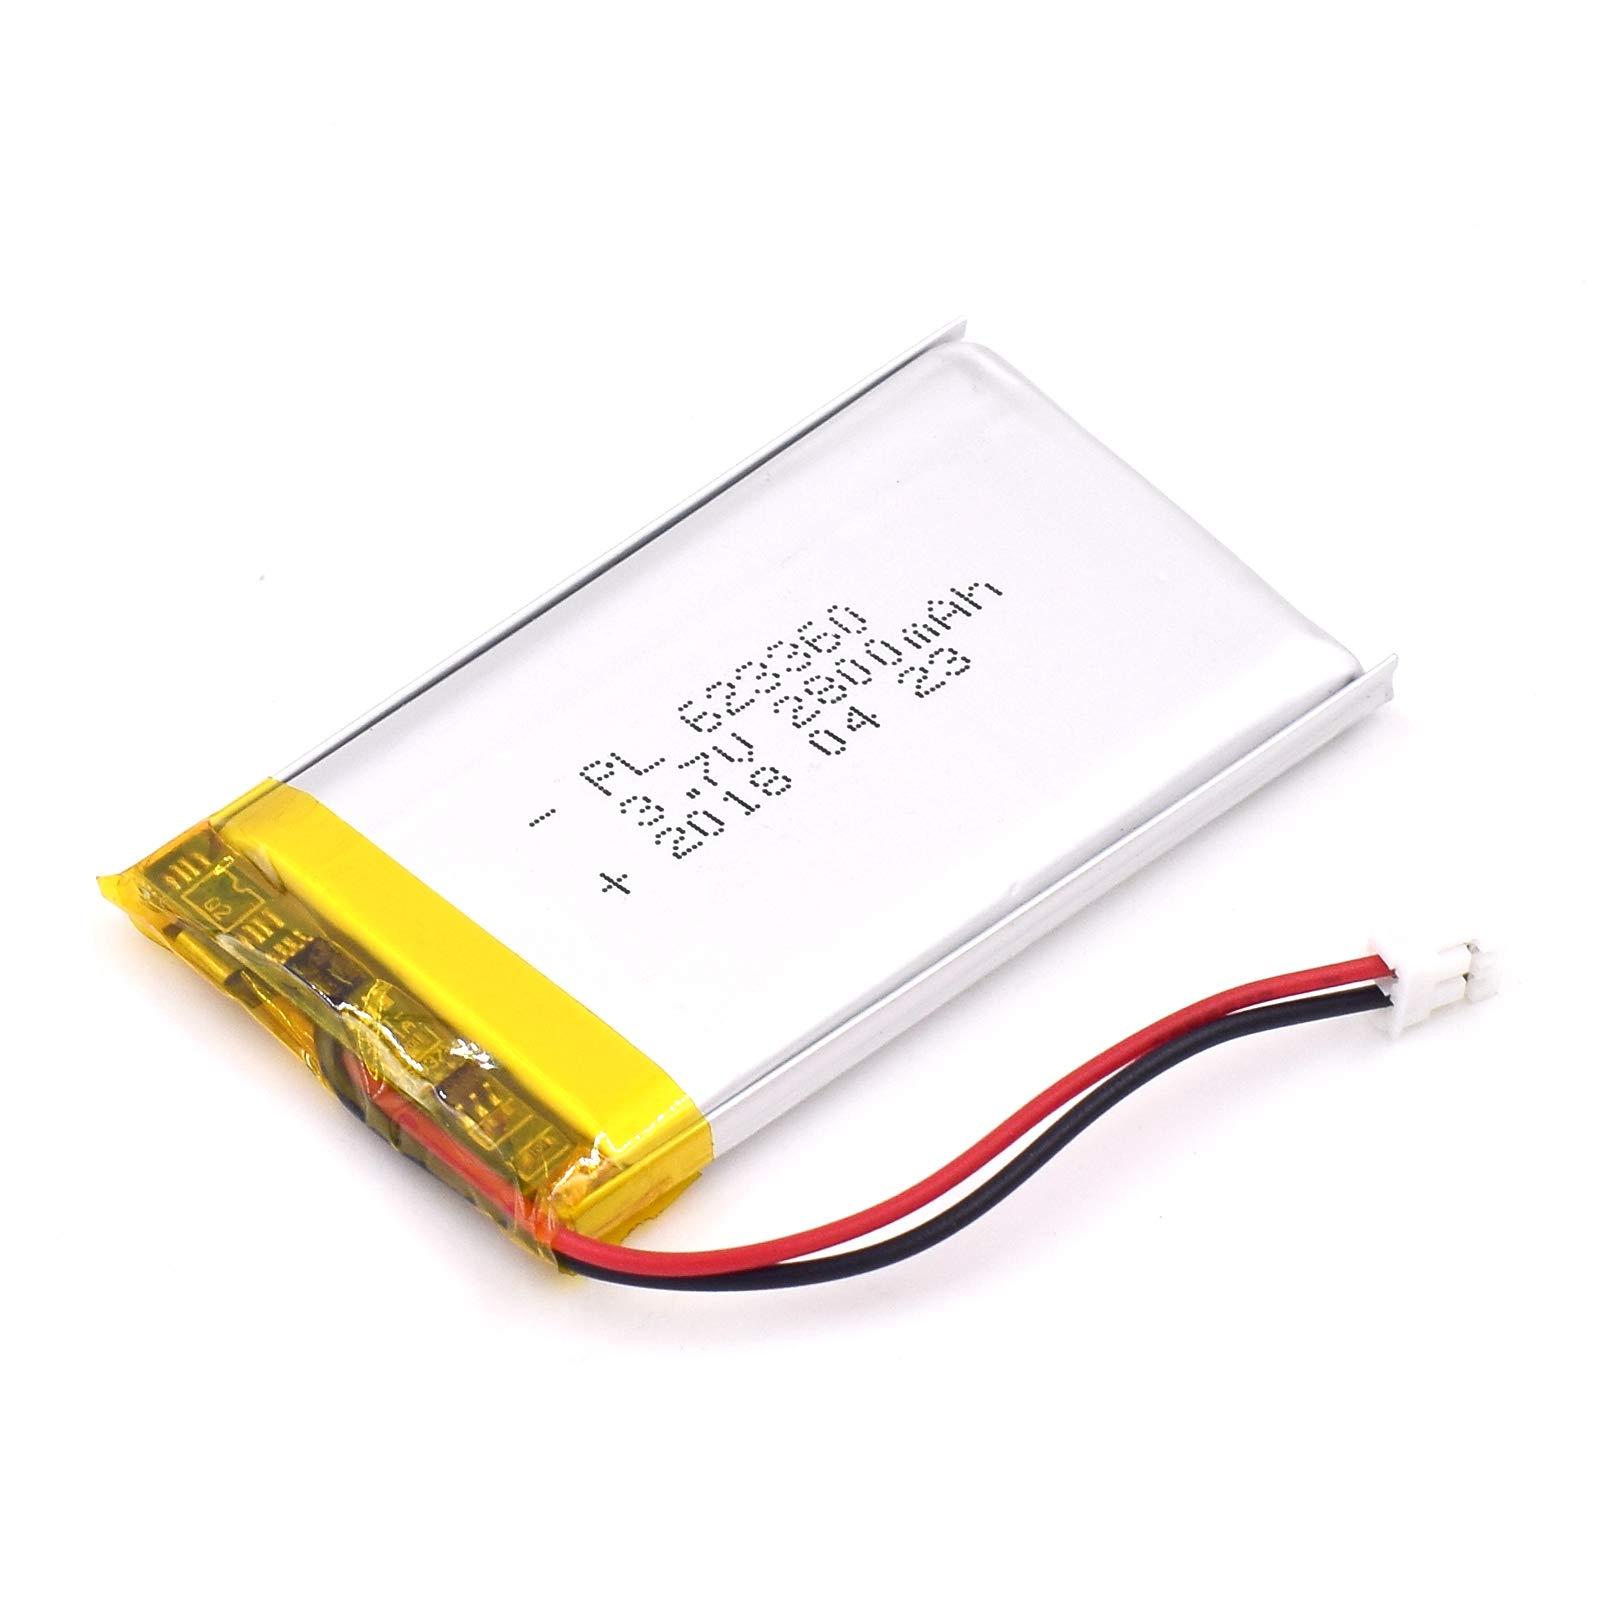 Bateria Lipo 3.7V 2800mAh 623360 Recargable JST Conector